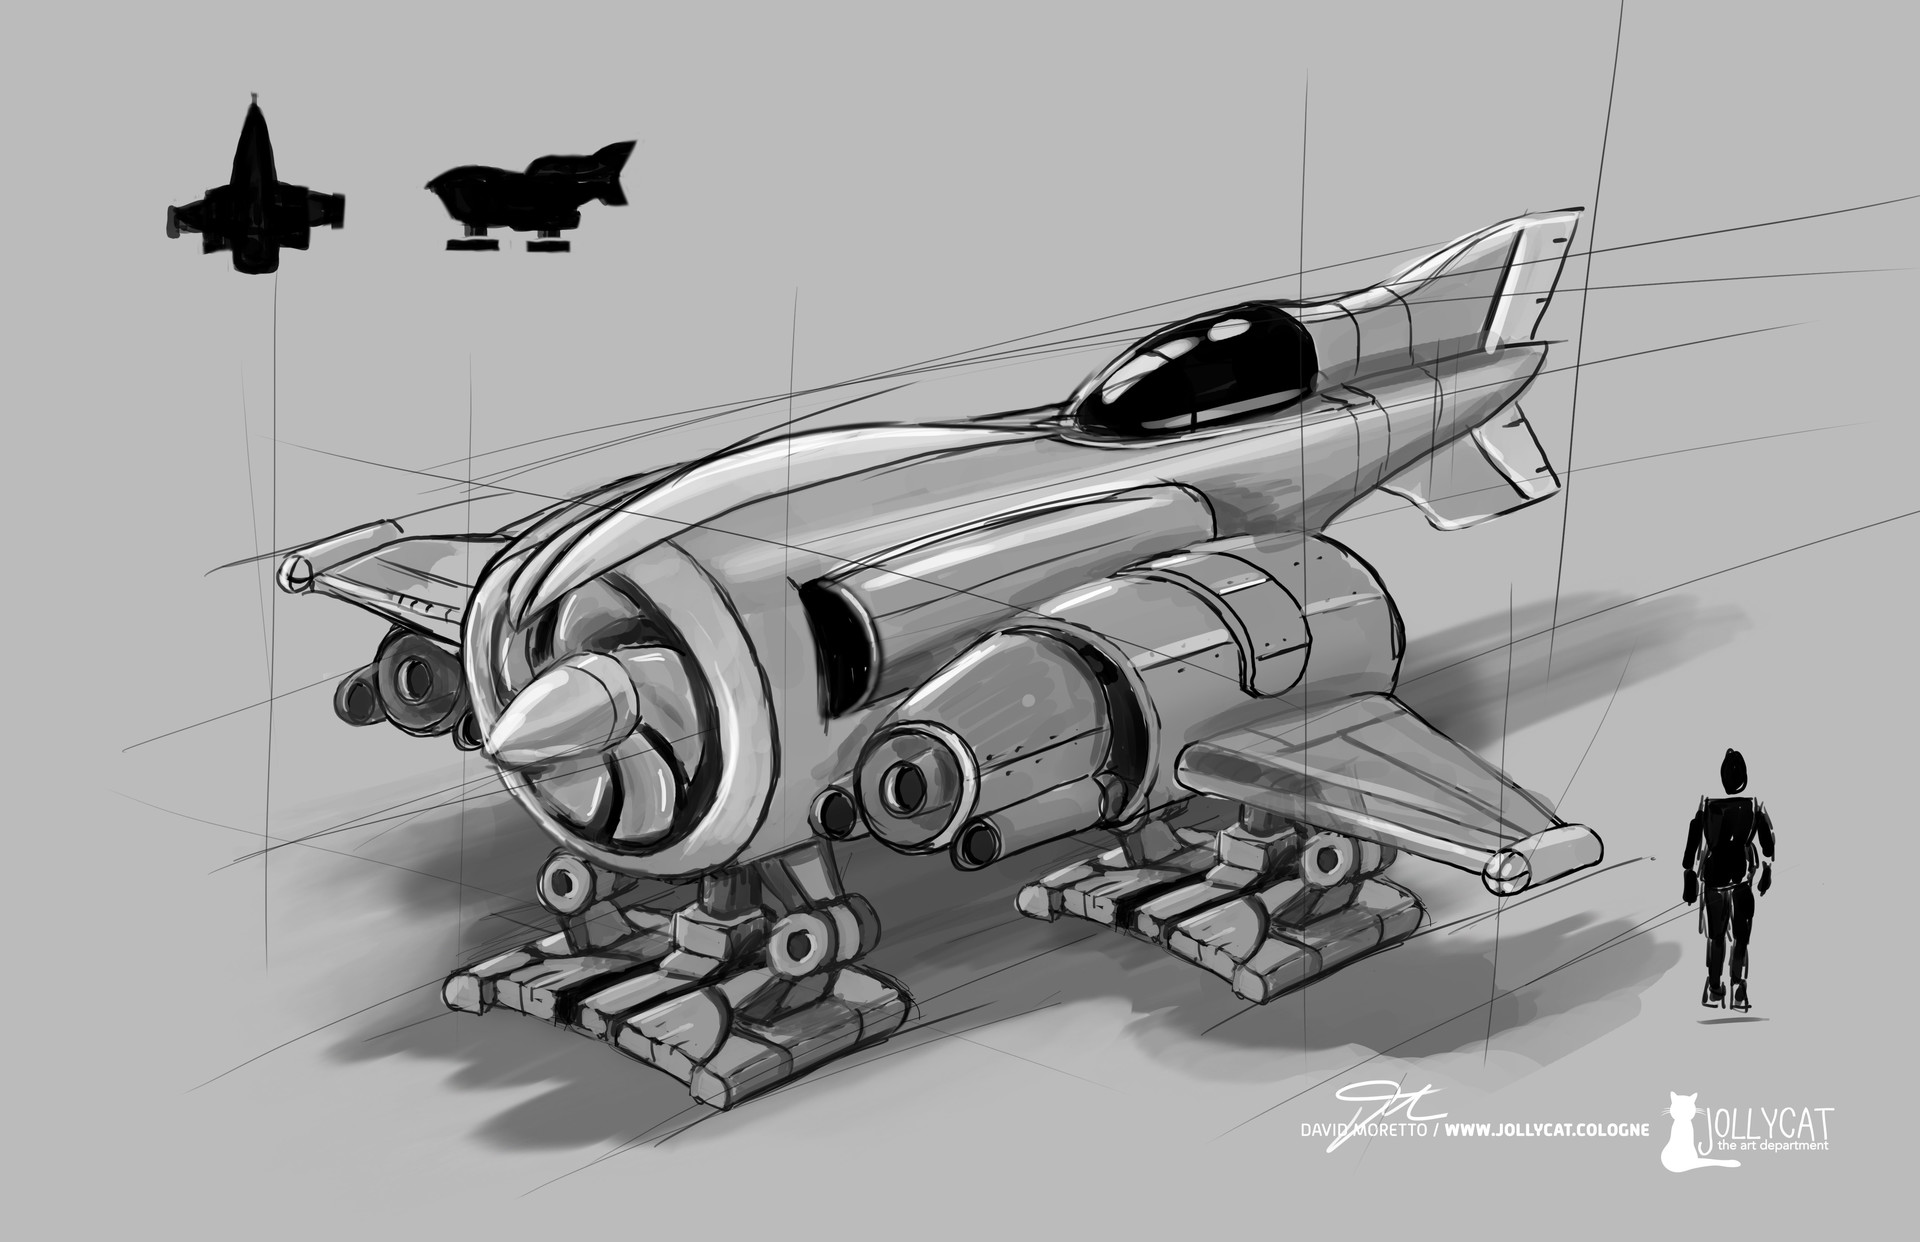 David moretto hardware plane2 v2